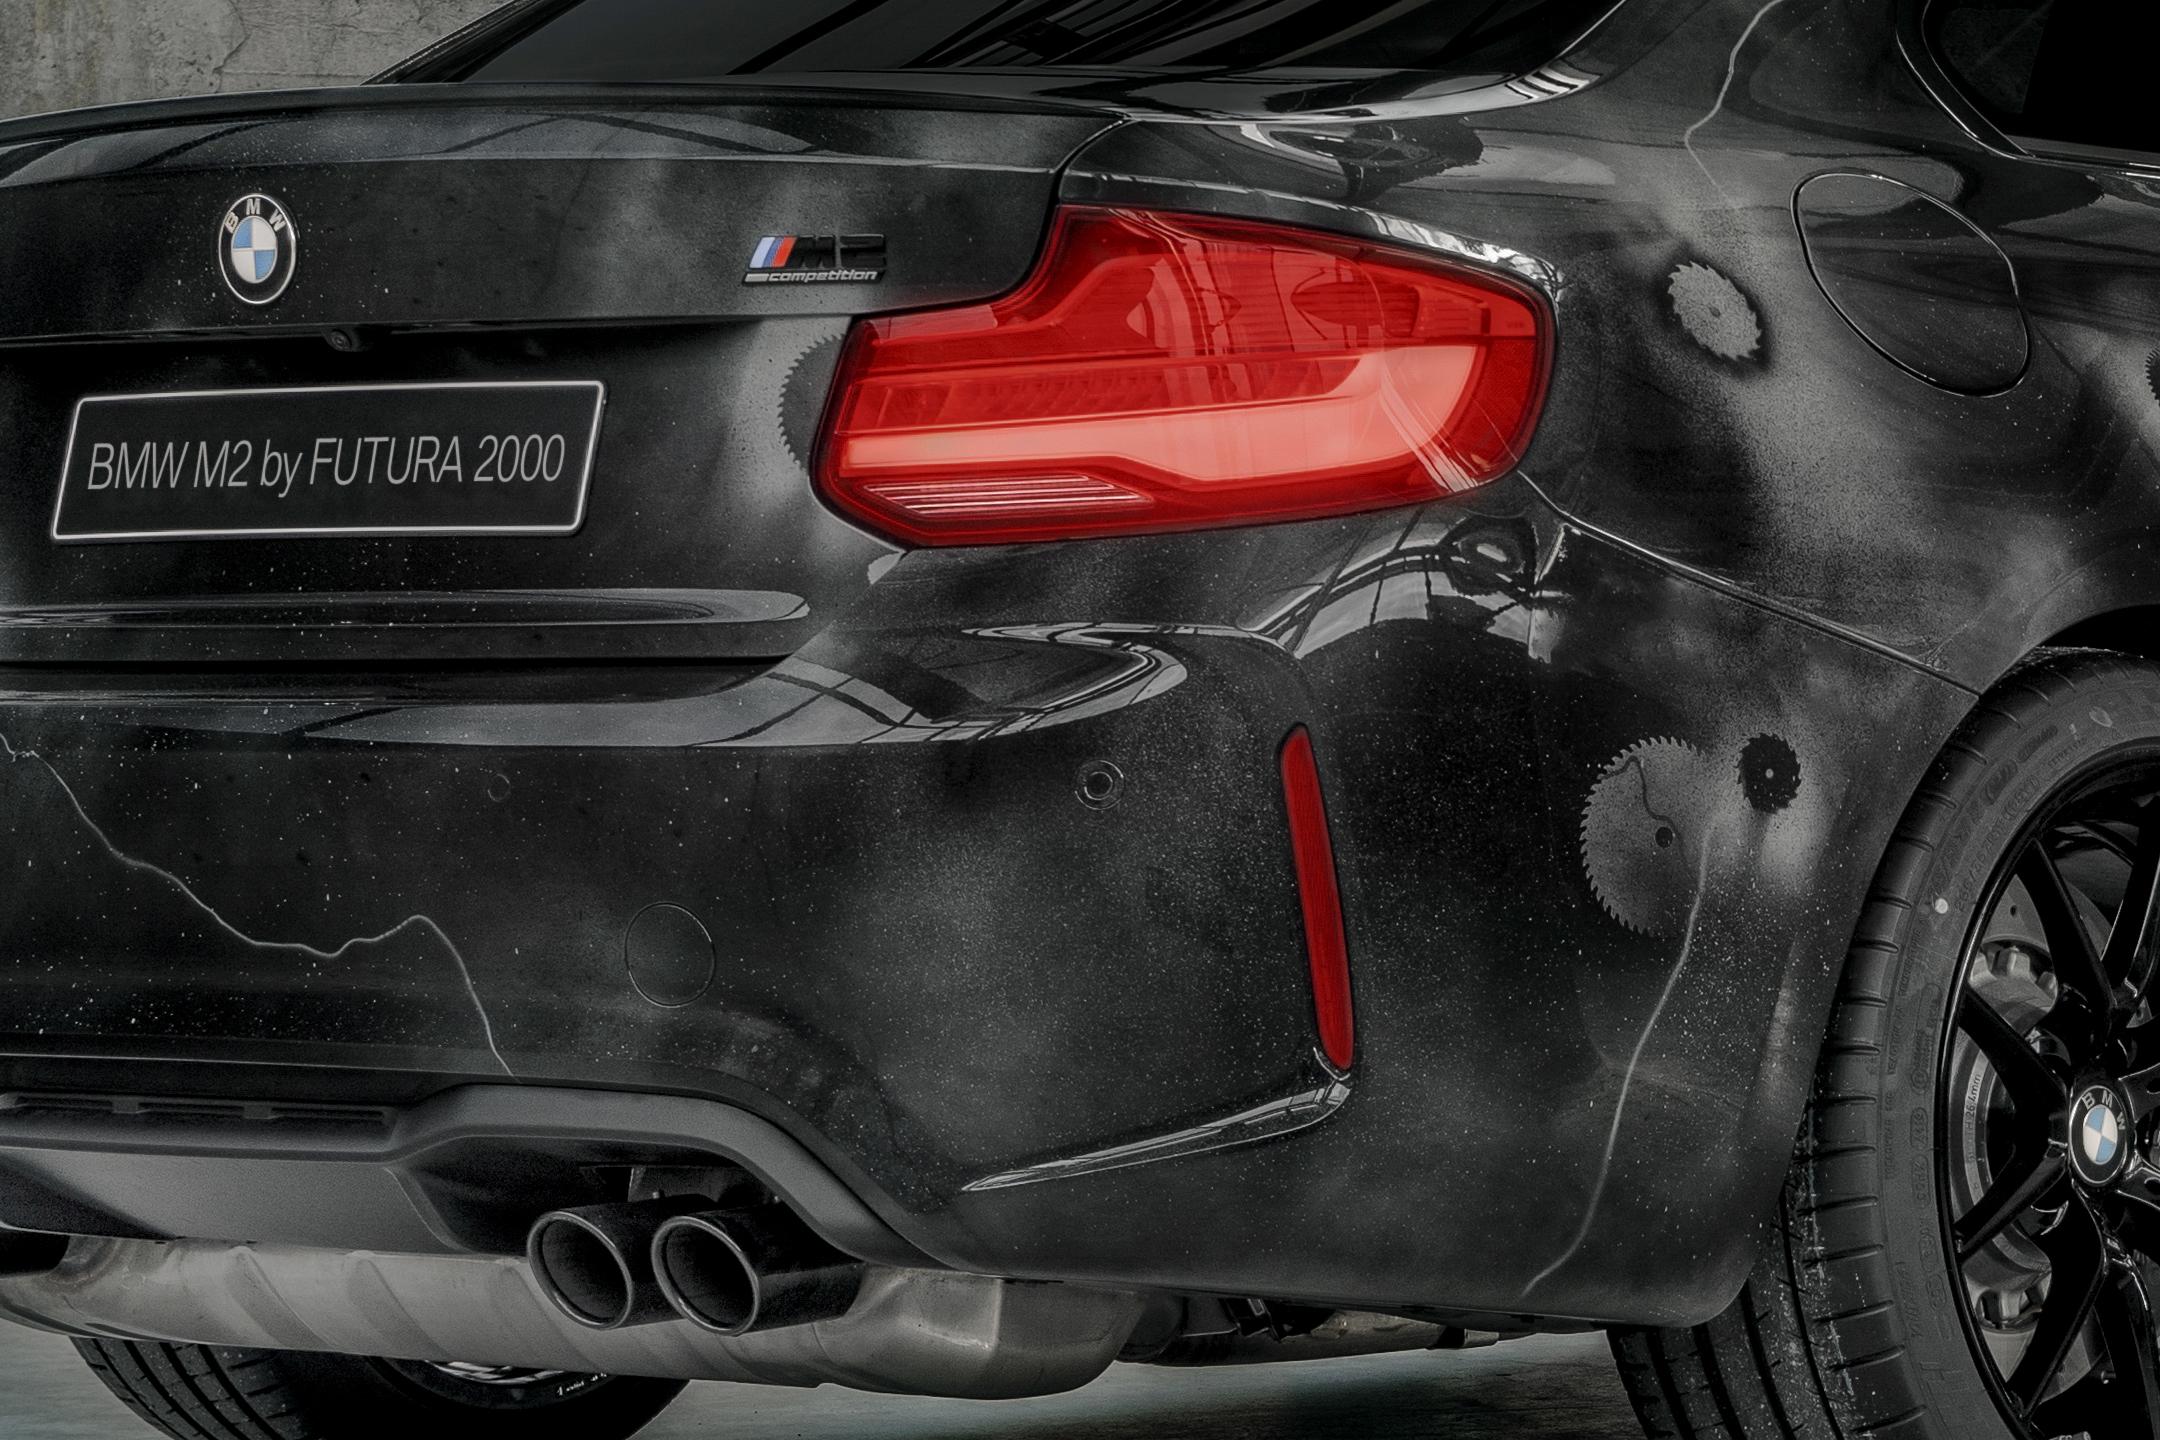 BMW M2 by FUTURA 2000 - Street Art Car - 2020 - rear light